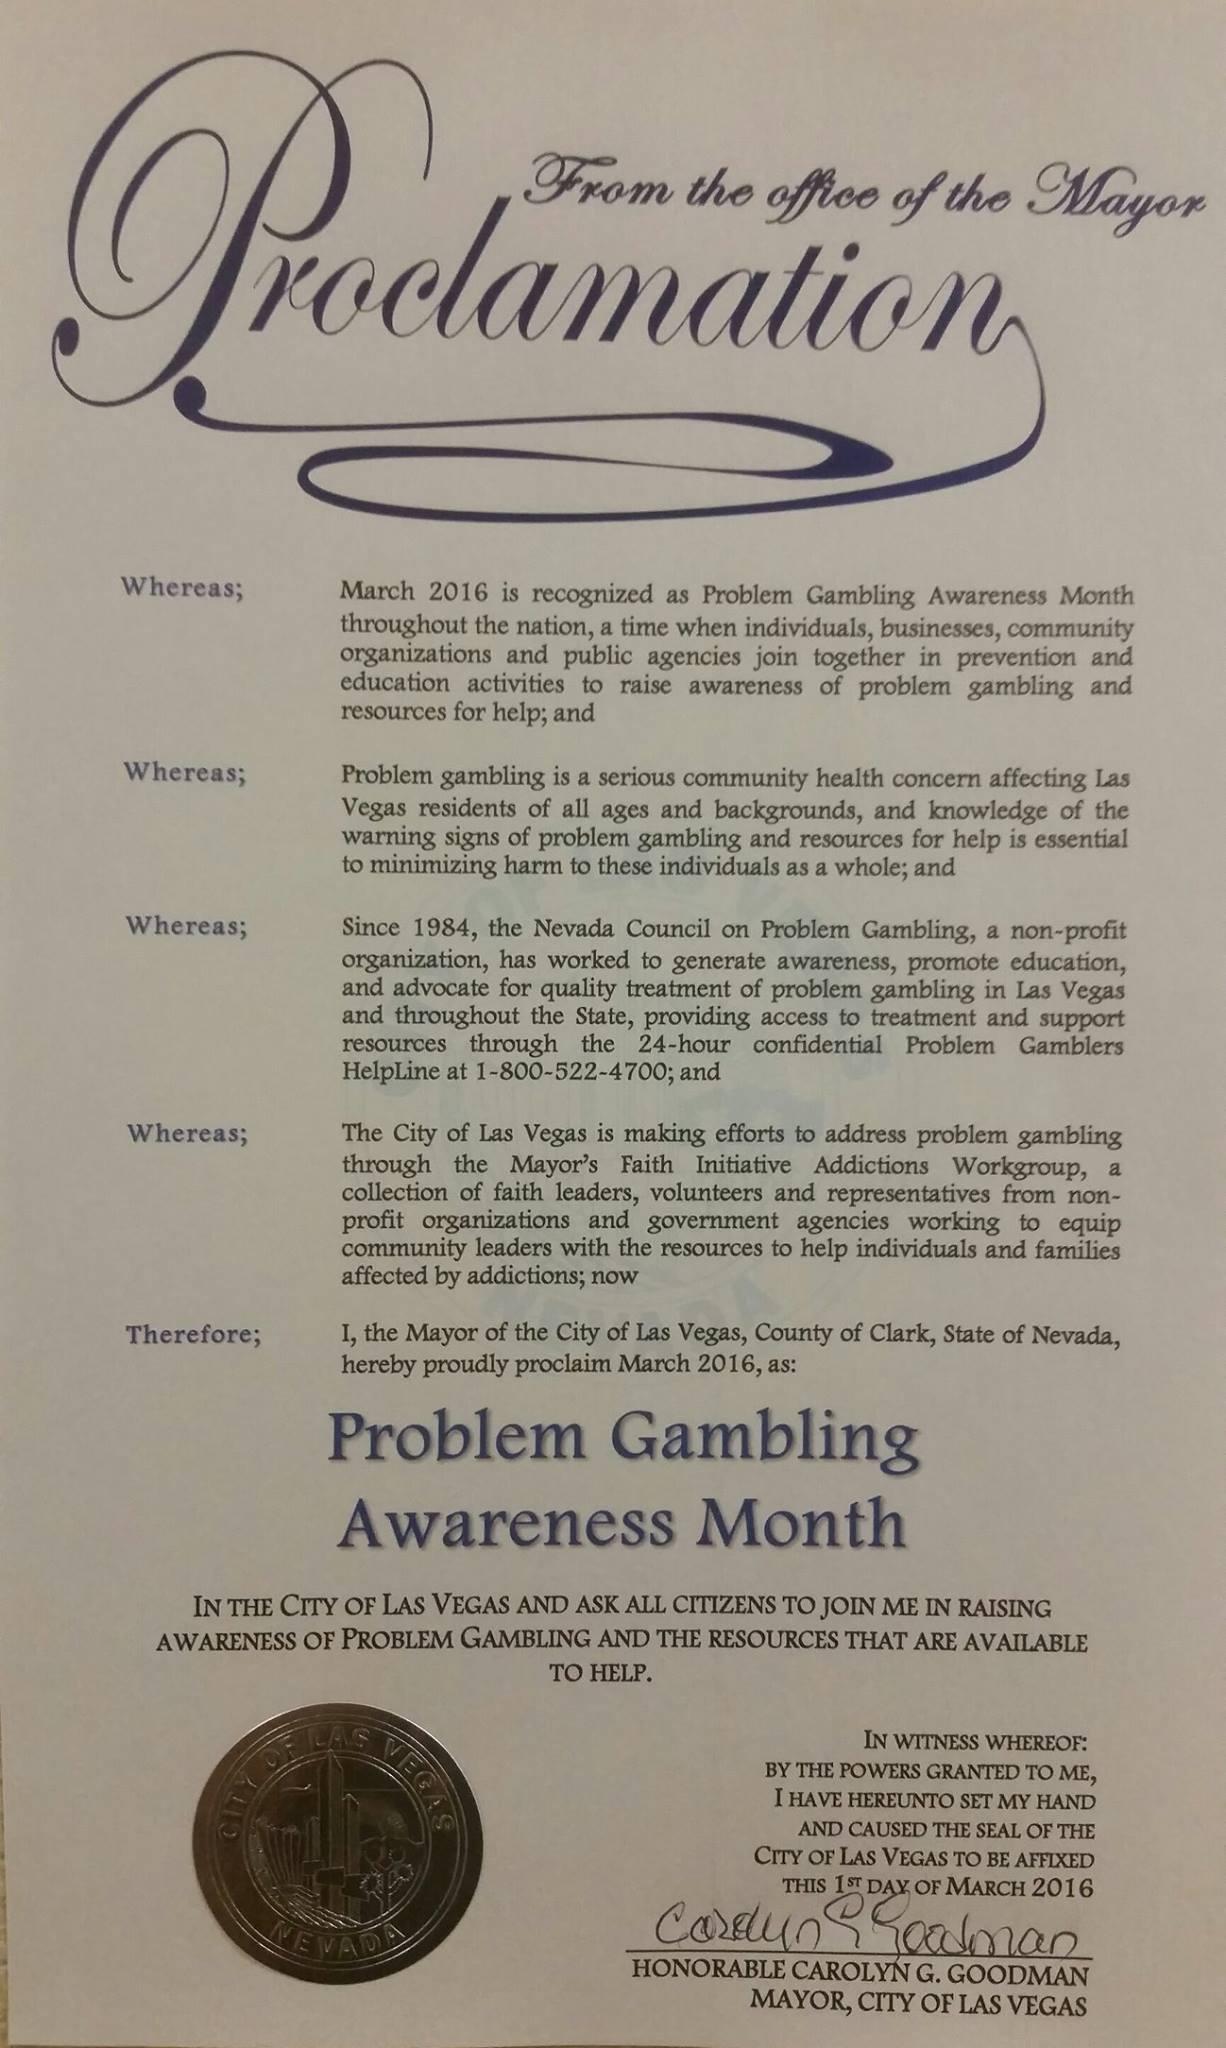 Nevada council problem gambling www 888 casino online com